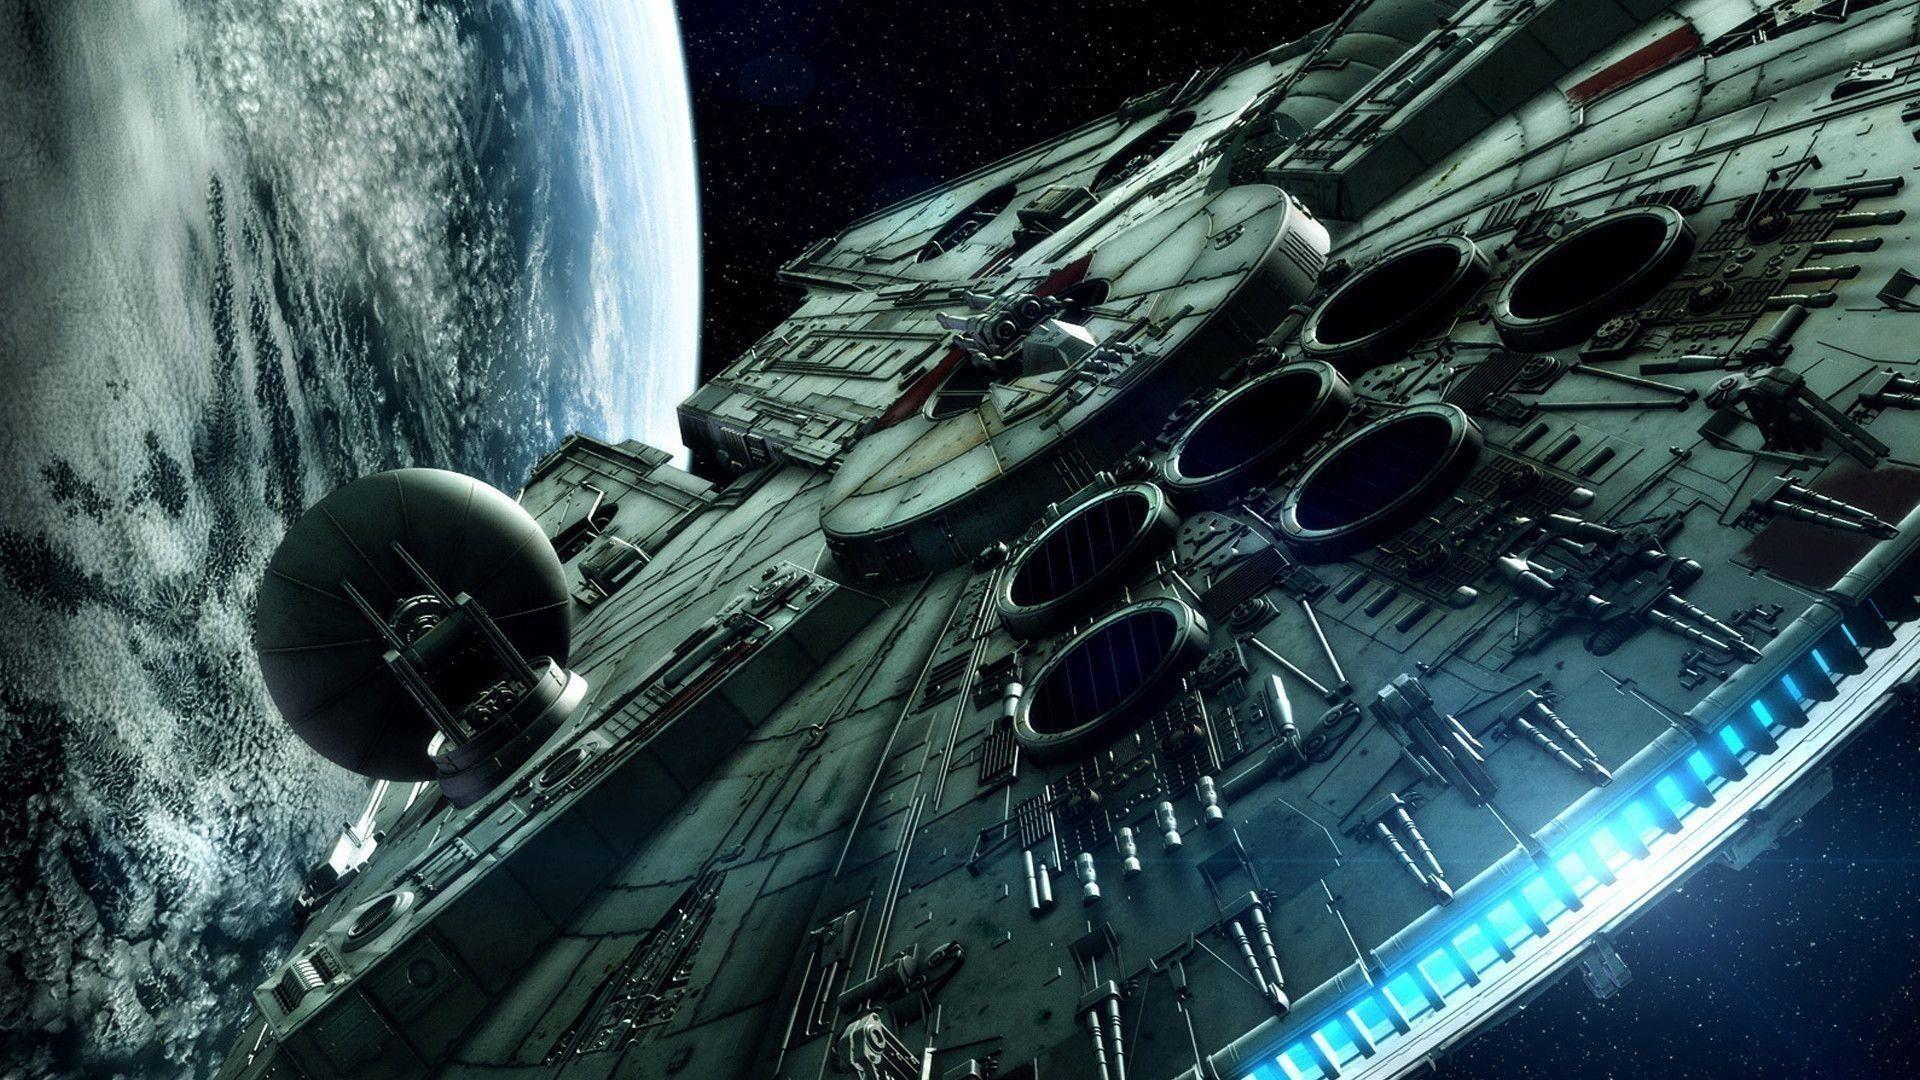 10 Top Star Wars Hd Wallpapers 1920x1080 Full Hd 1920 1080 For Pc Background Star Wars Wallpaper Star Wars Background Star Wars Illustration